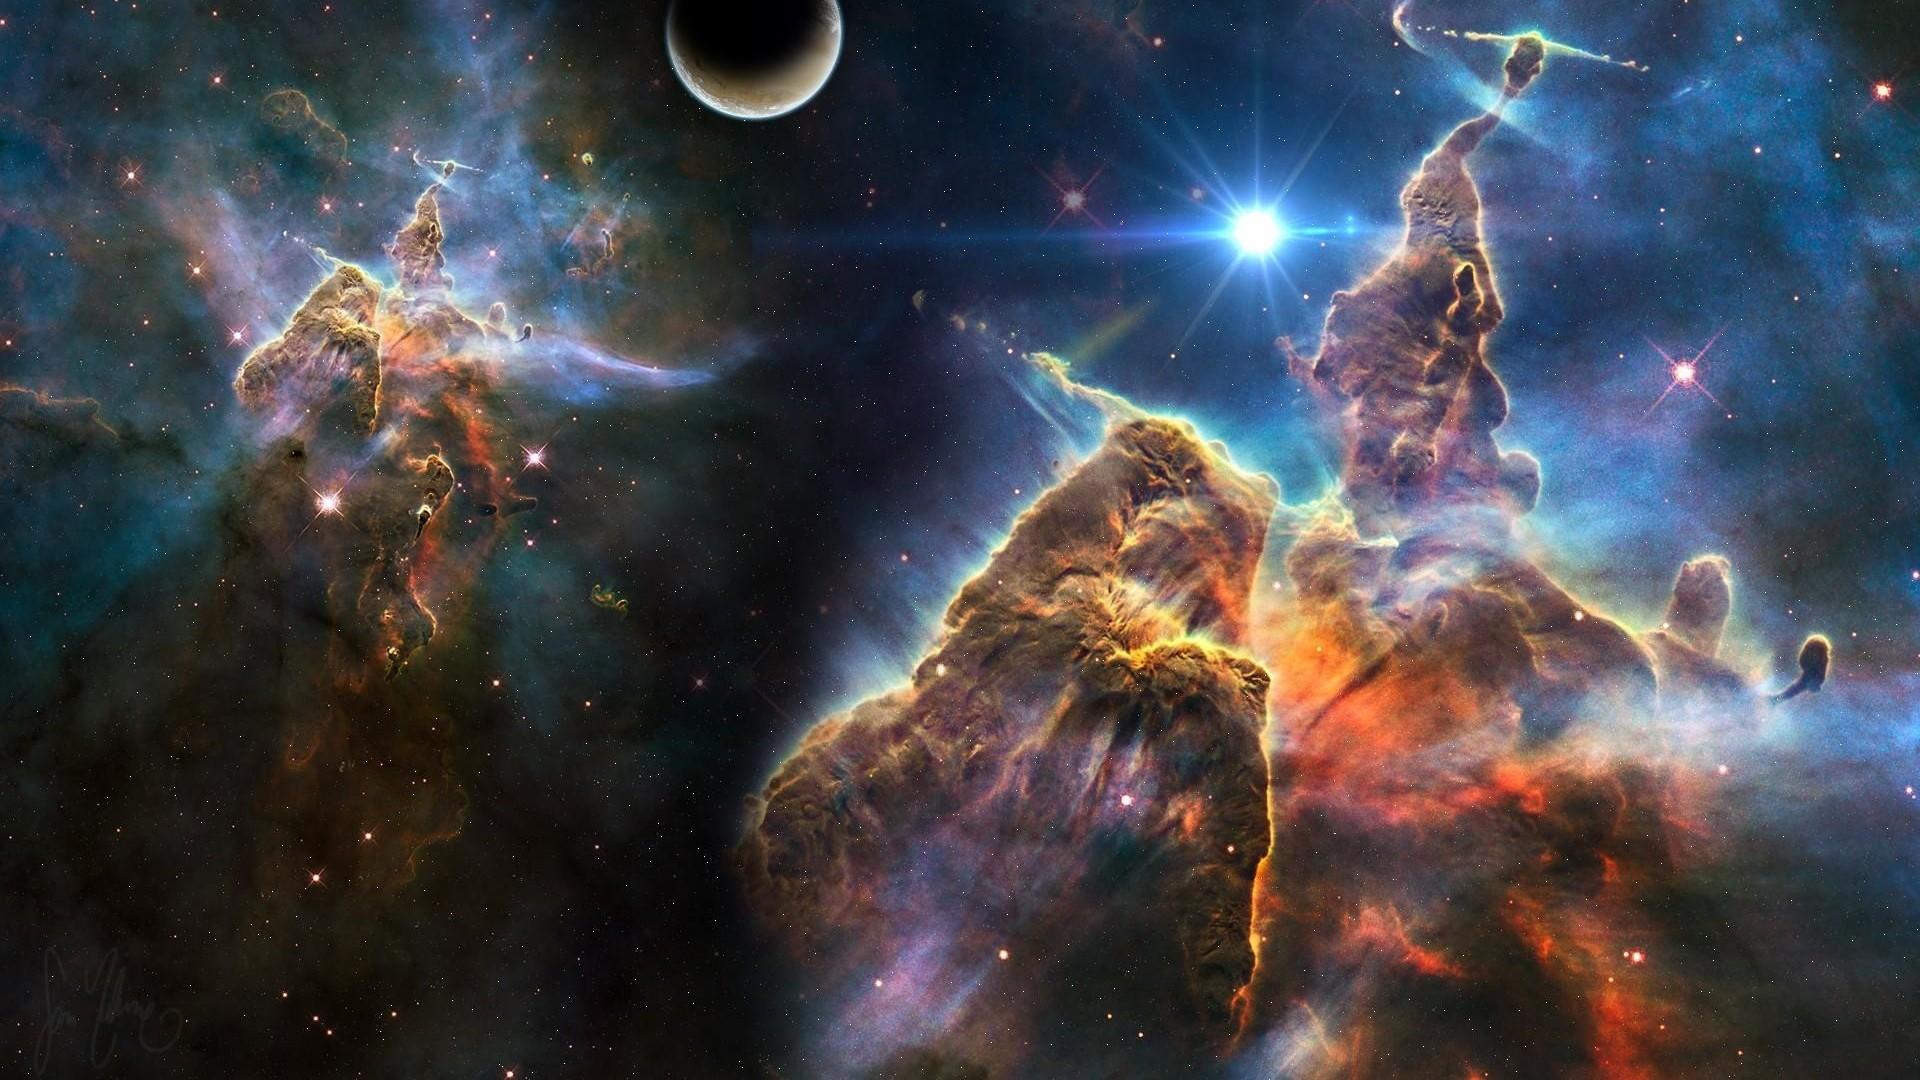 universe, stars, galaxies; universe, stars, planets